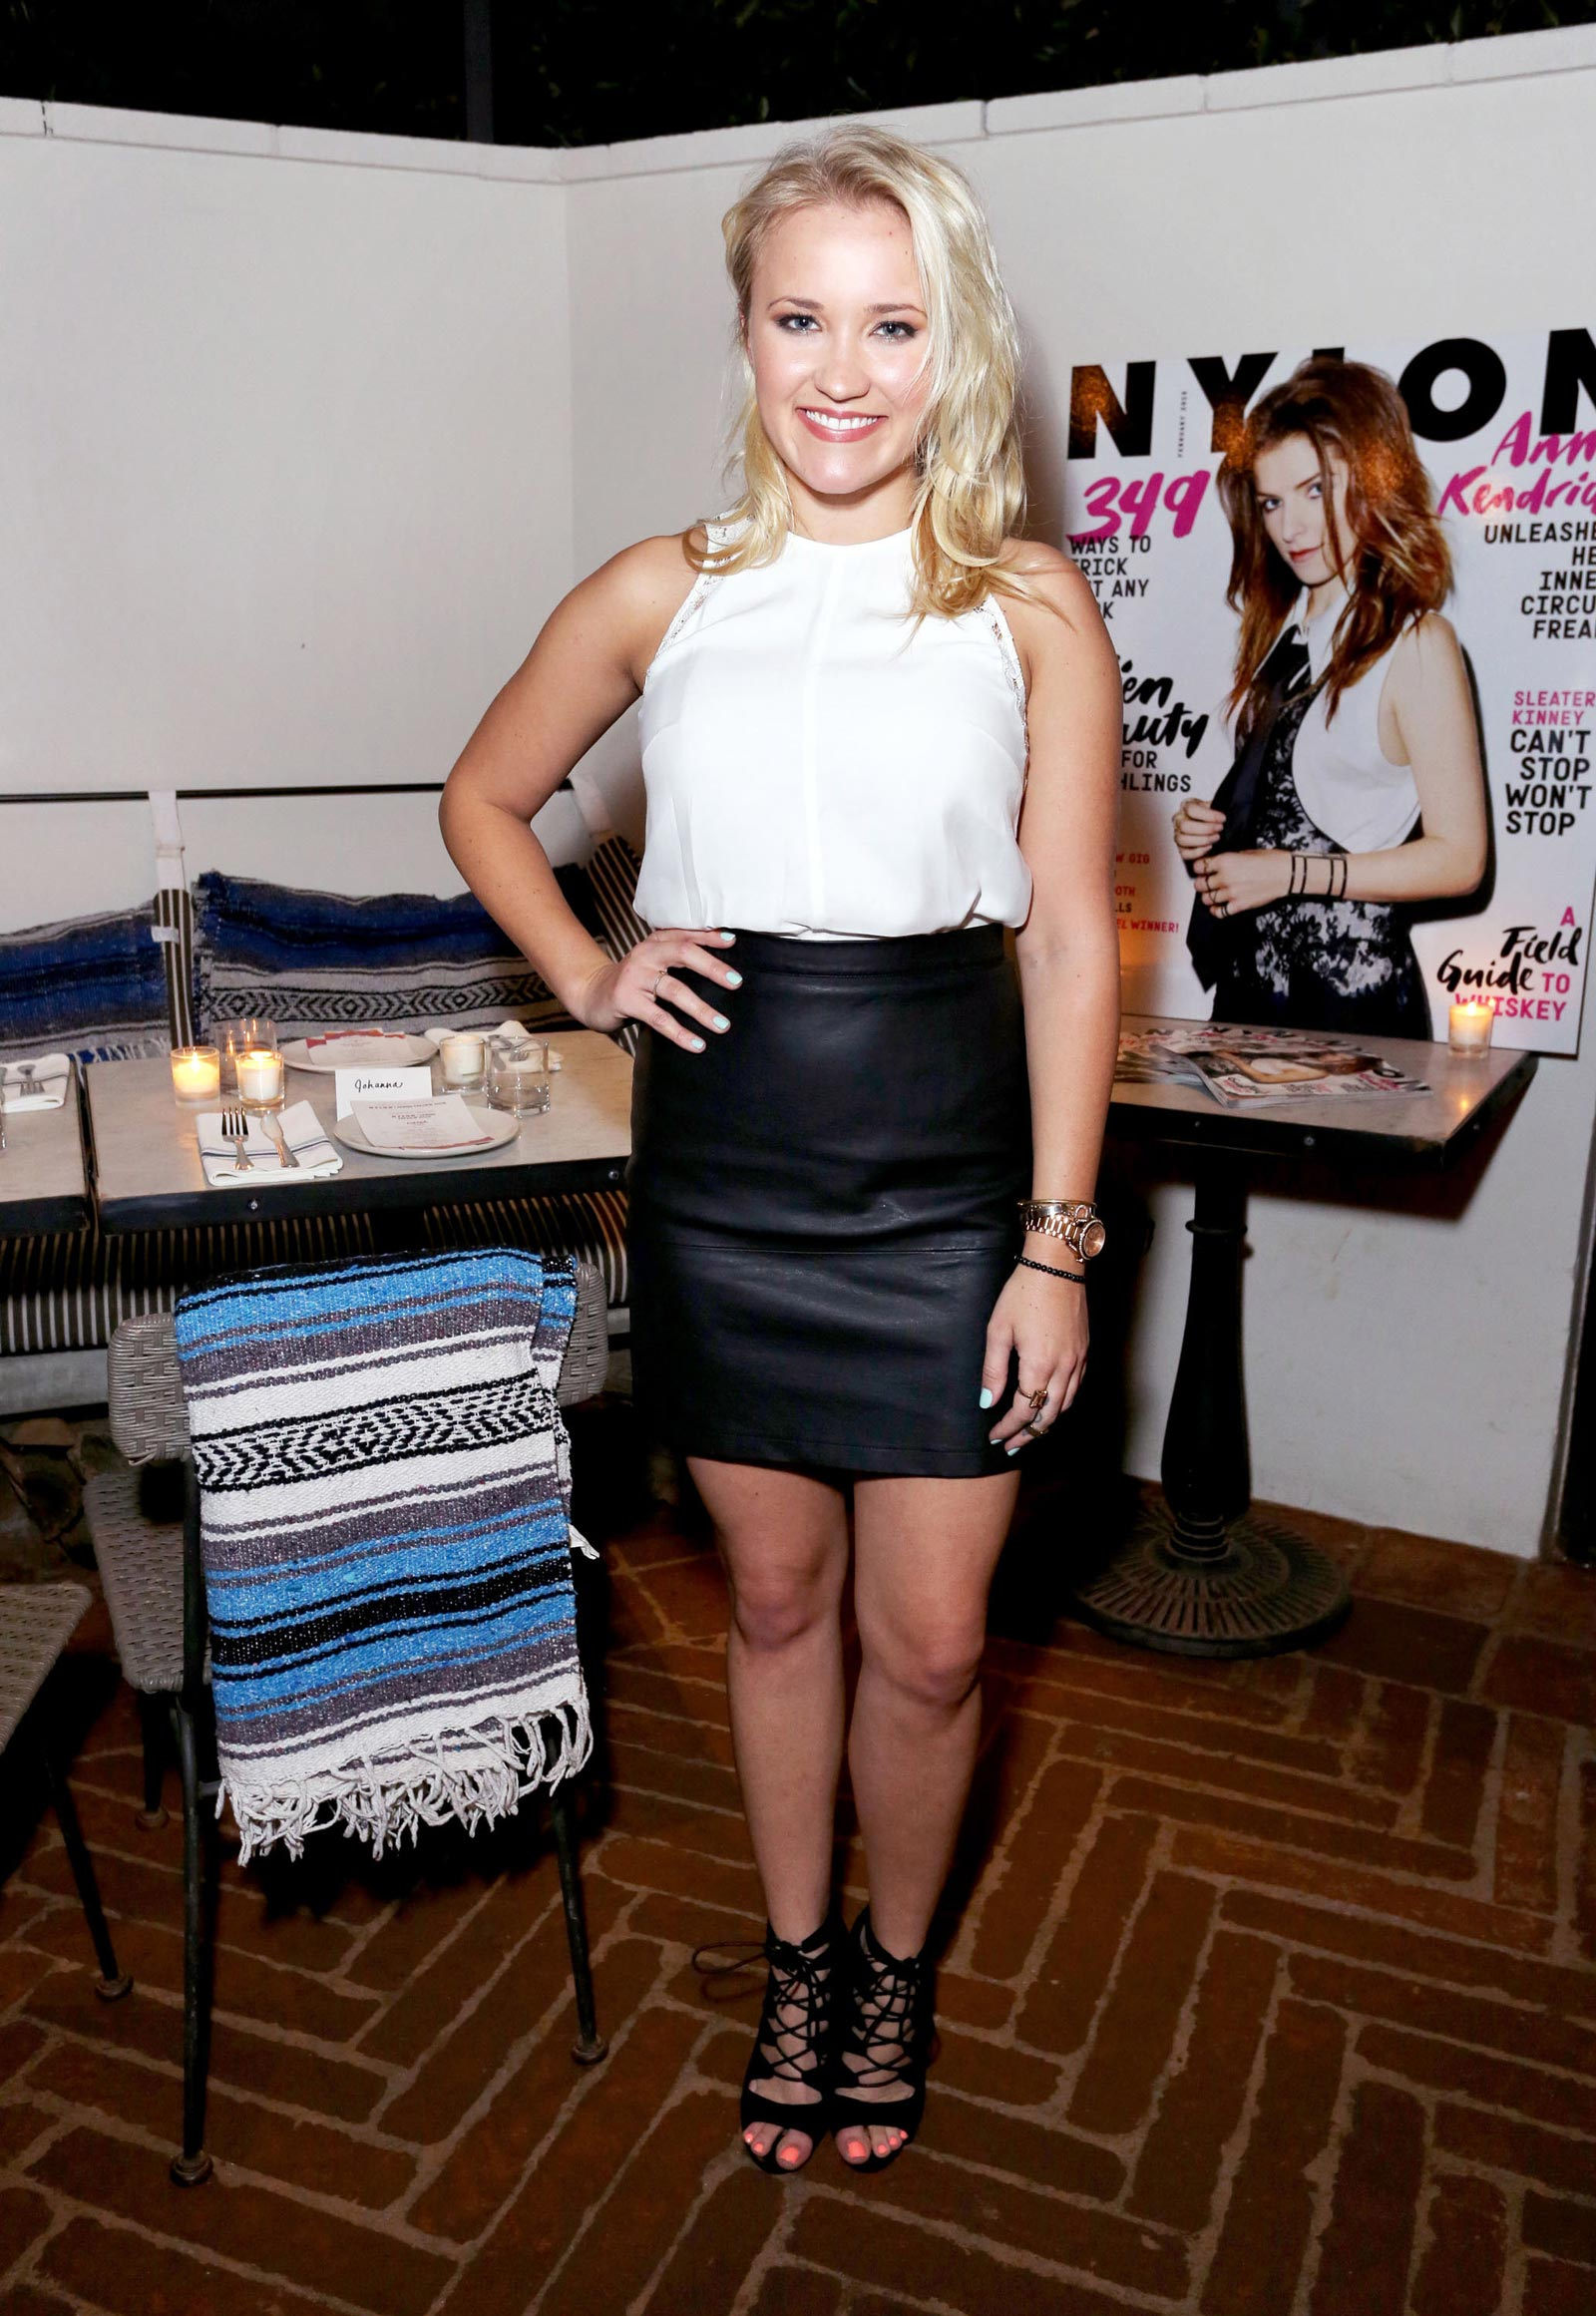 Emily Osment attends NYLON Celebrates Anna Kendrick's February Cover Anna Kendrick